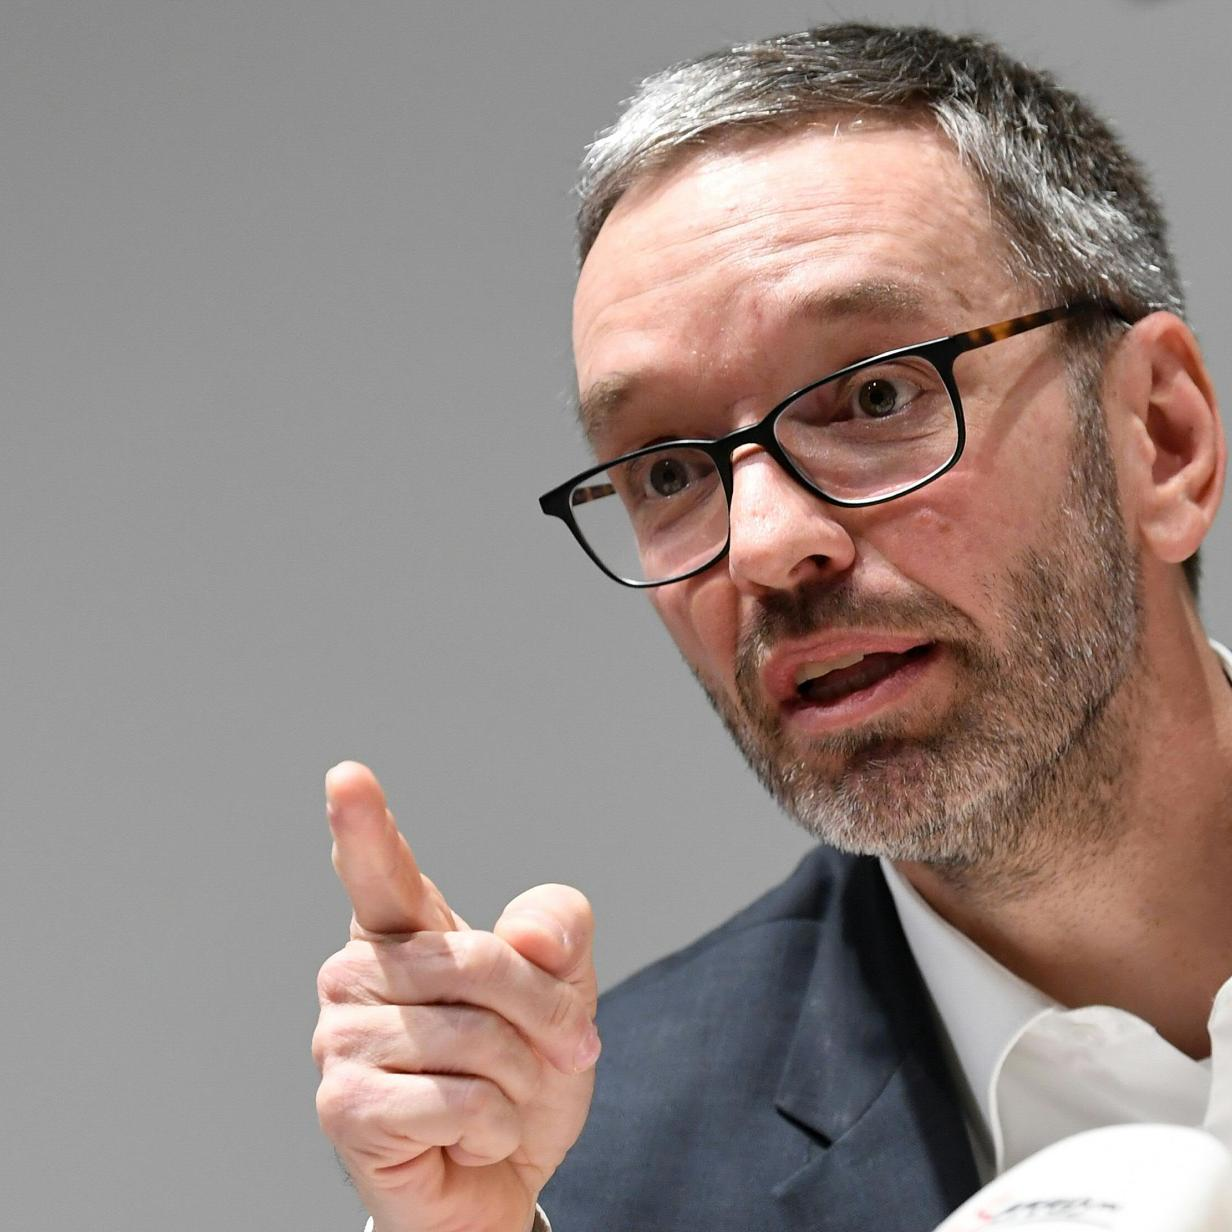 FPÖ-Klubobmann Kickl hält am Dienstag Vortrag bei AfD